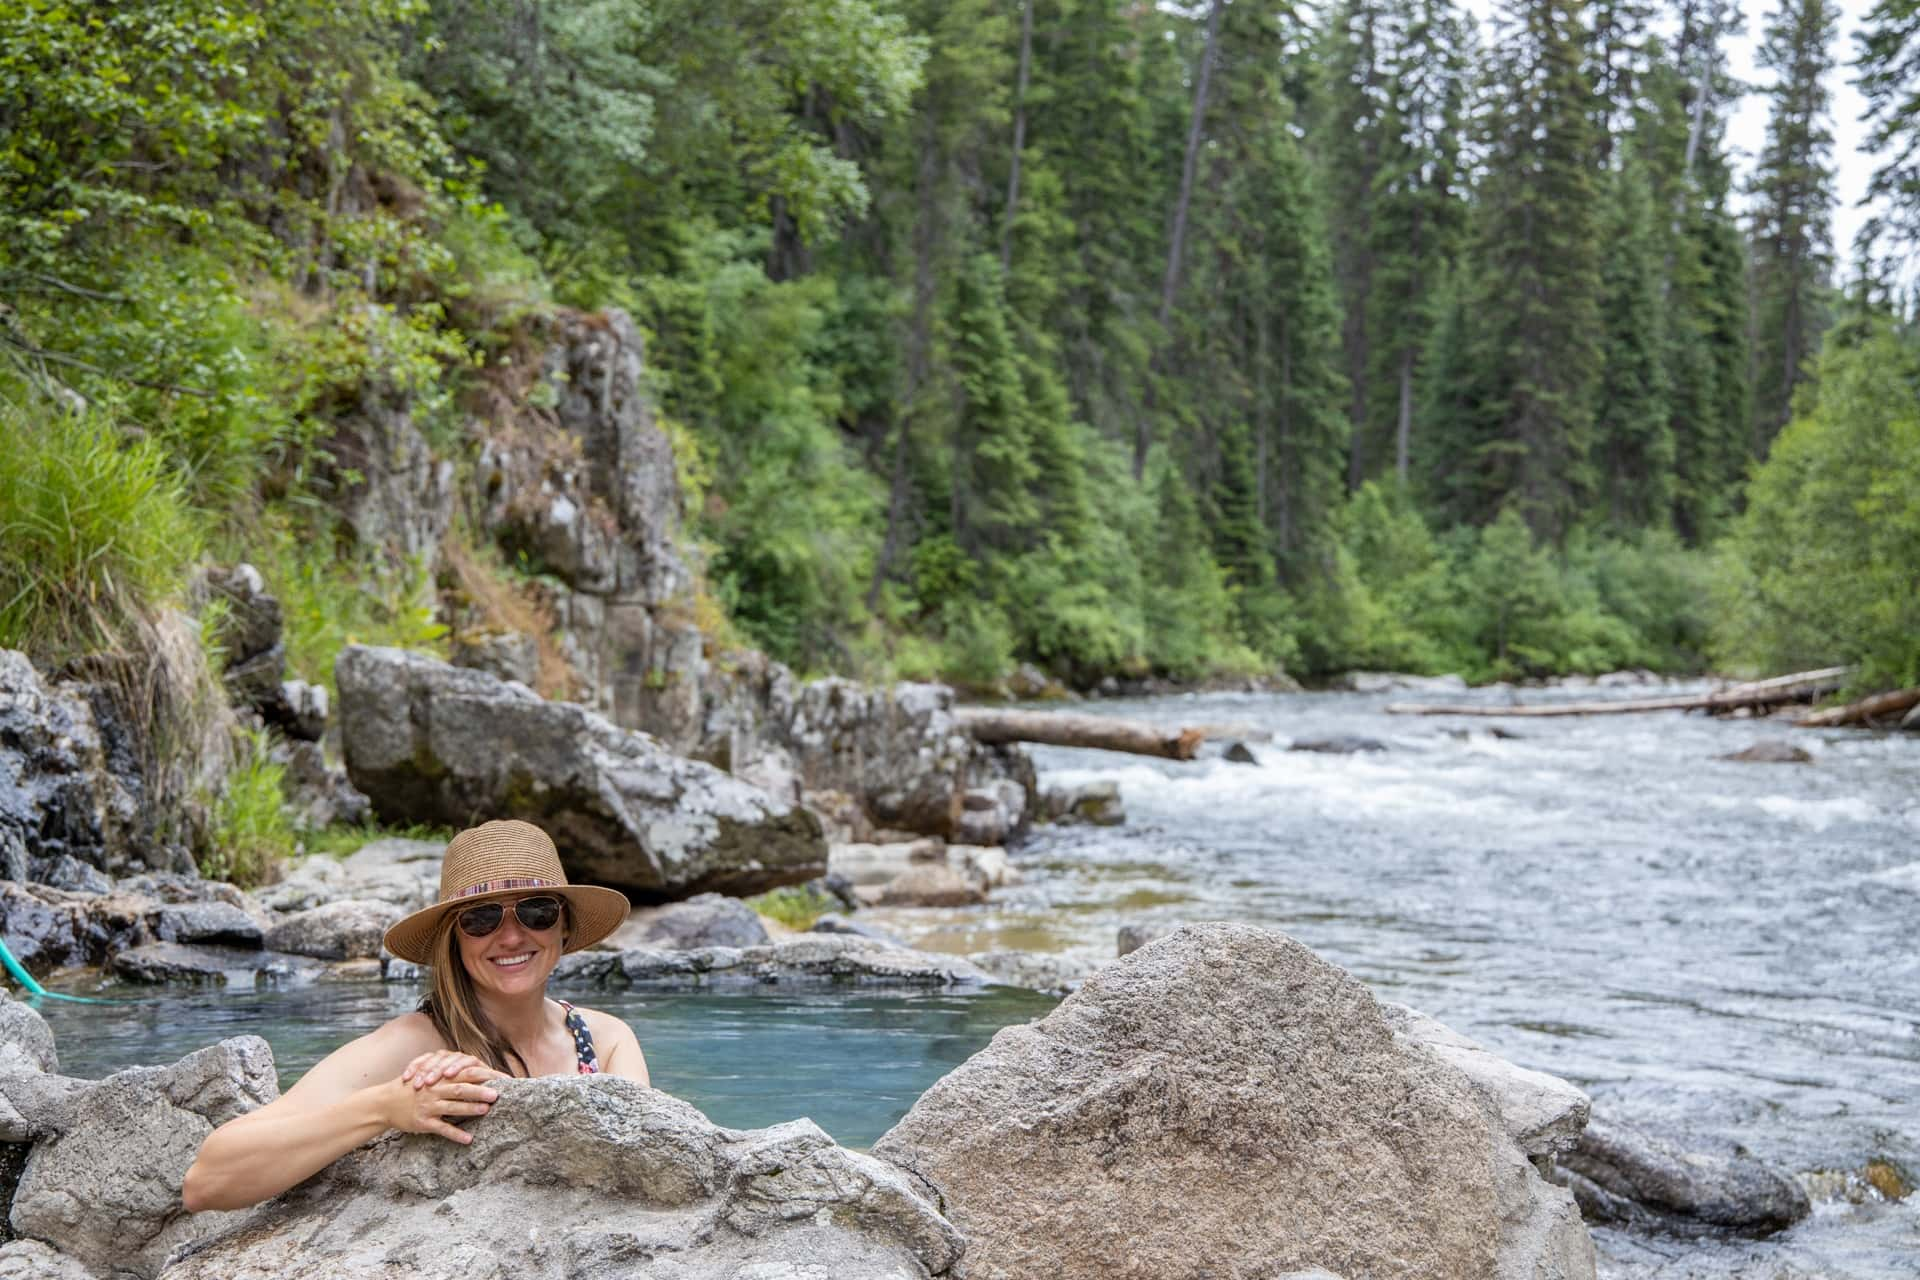 Hot springs in Cascade Idaho